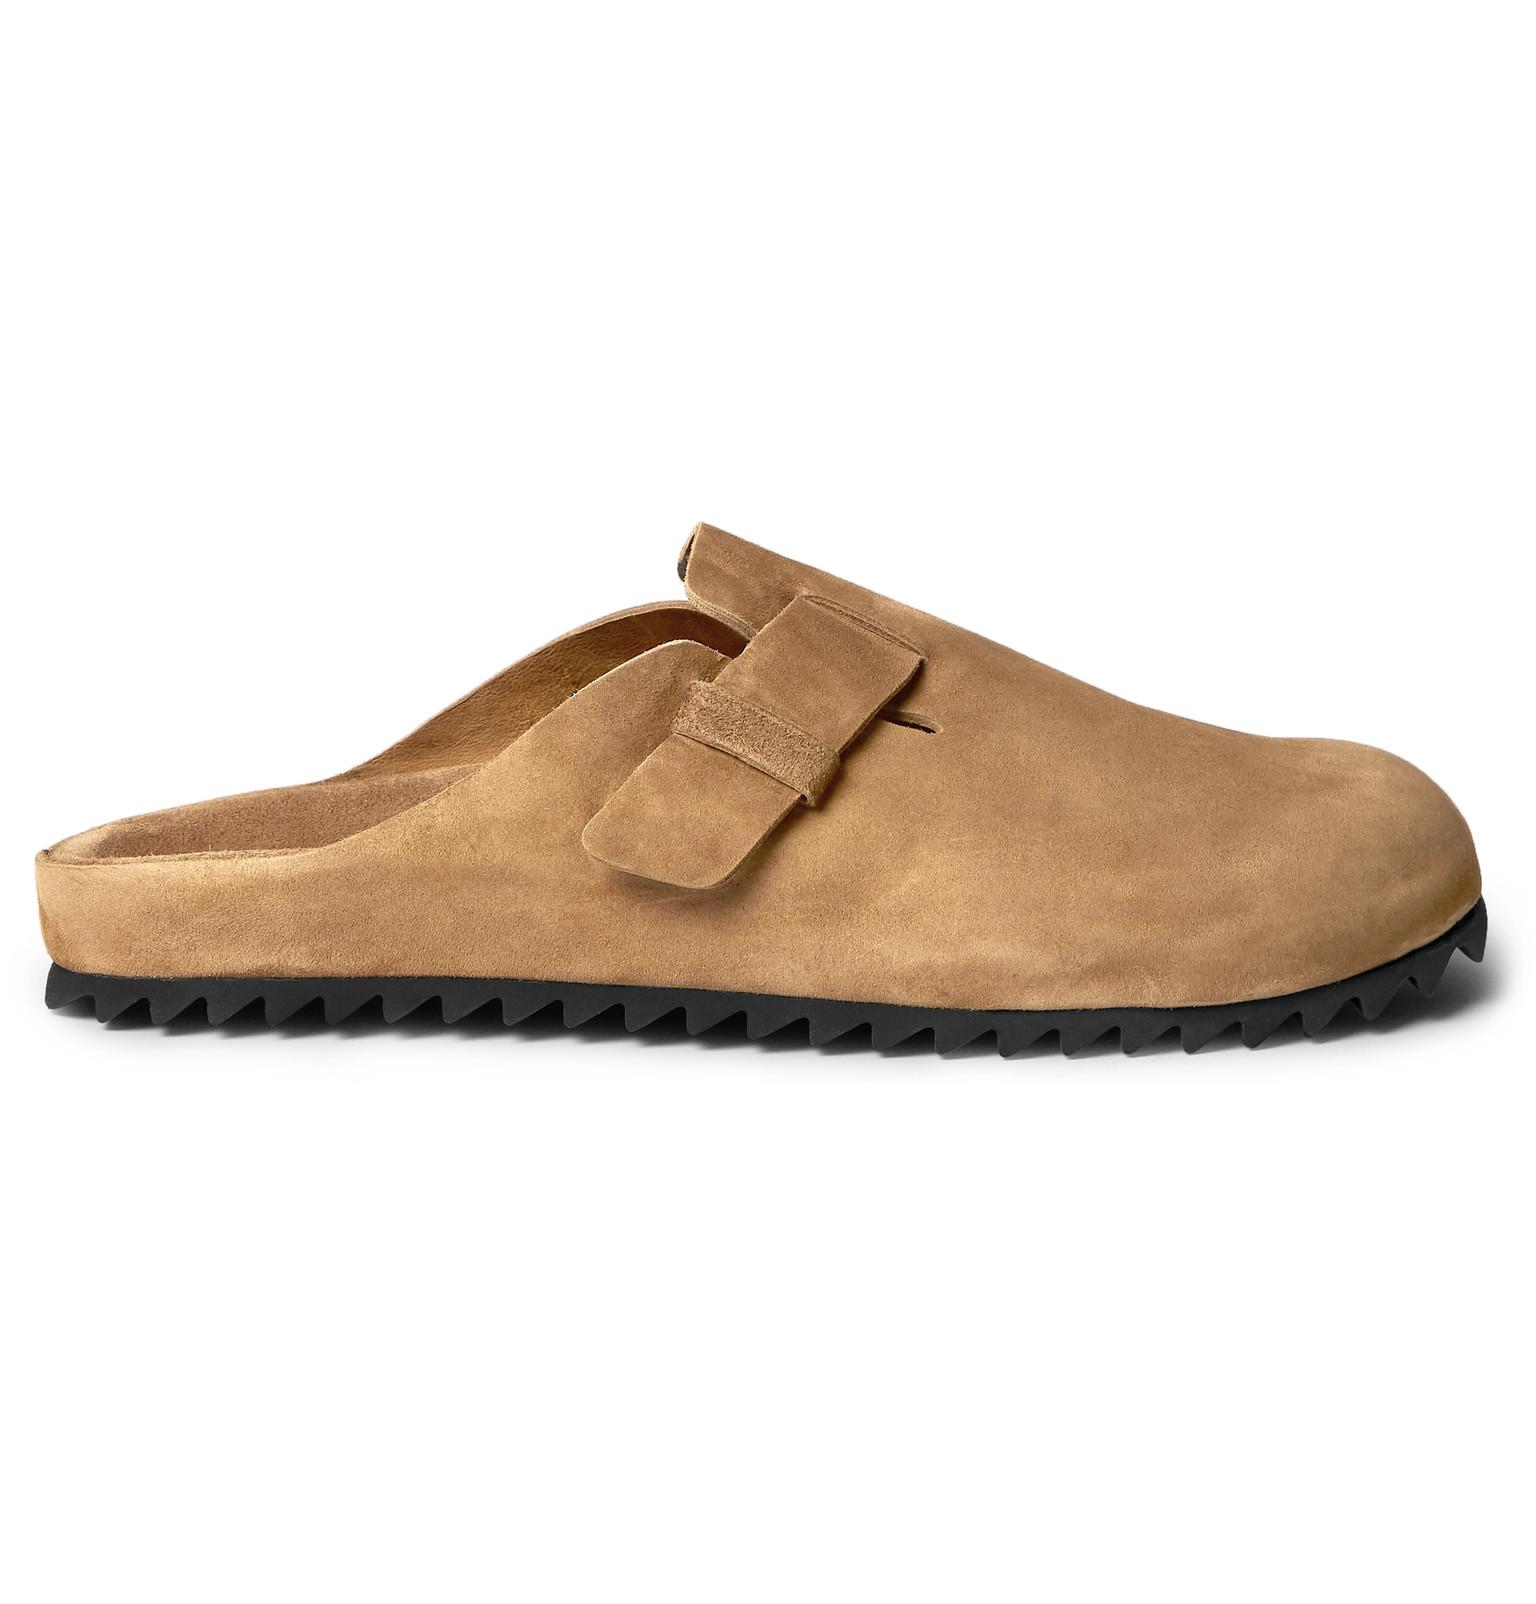 8a572347b10 Officine Creative - Agora Suede Sandals